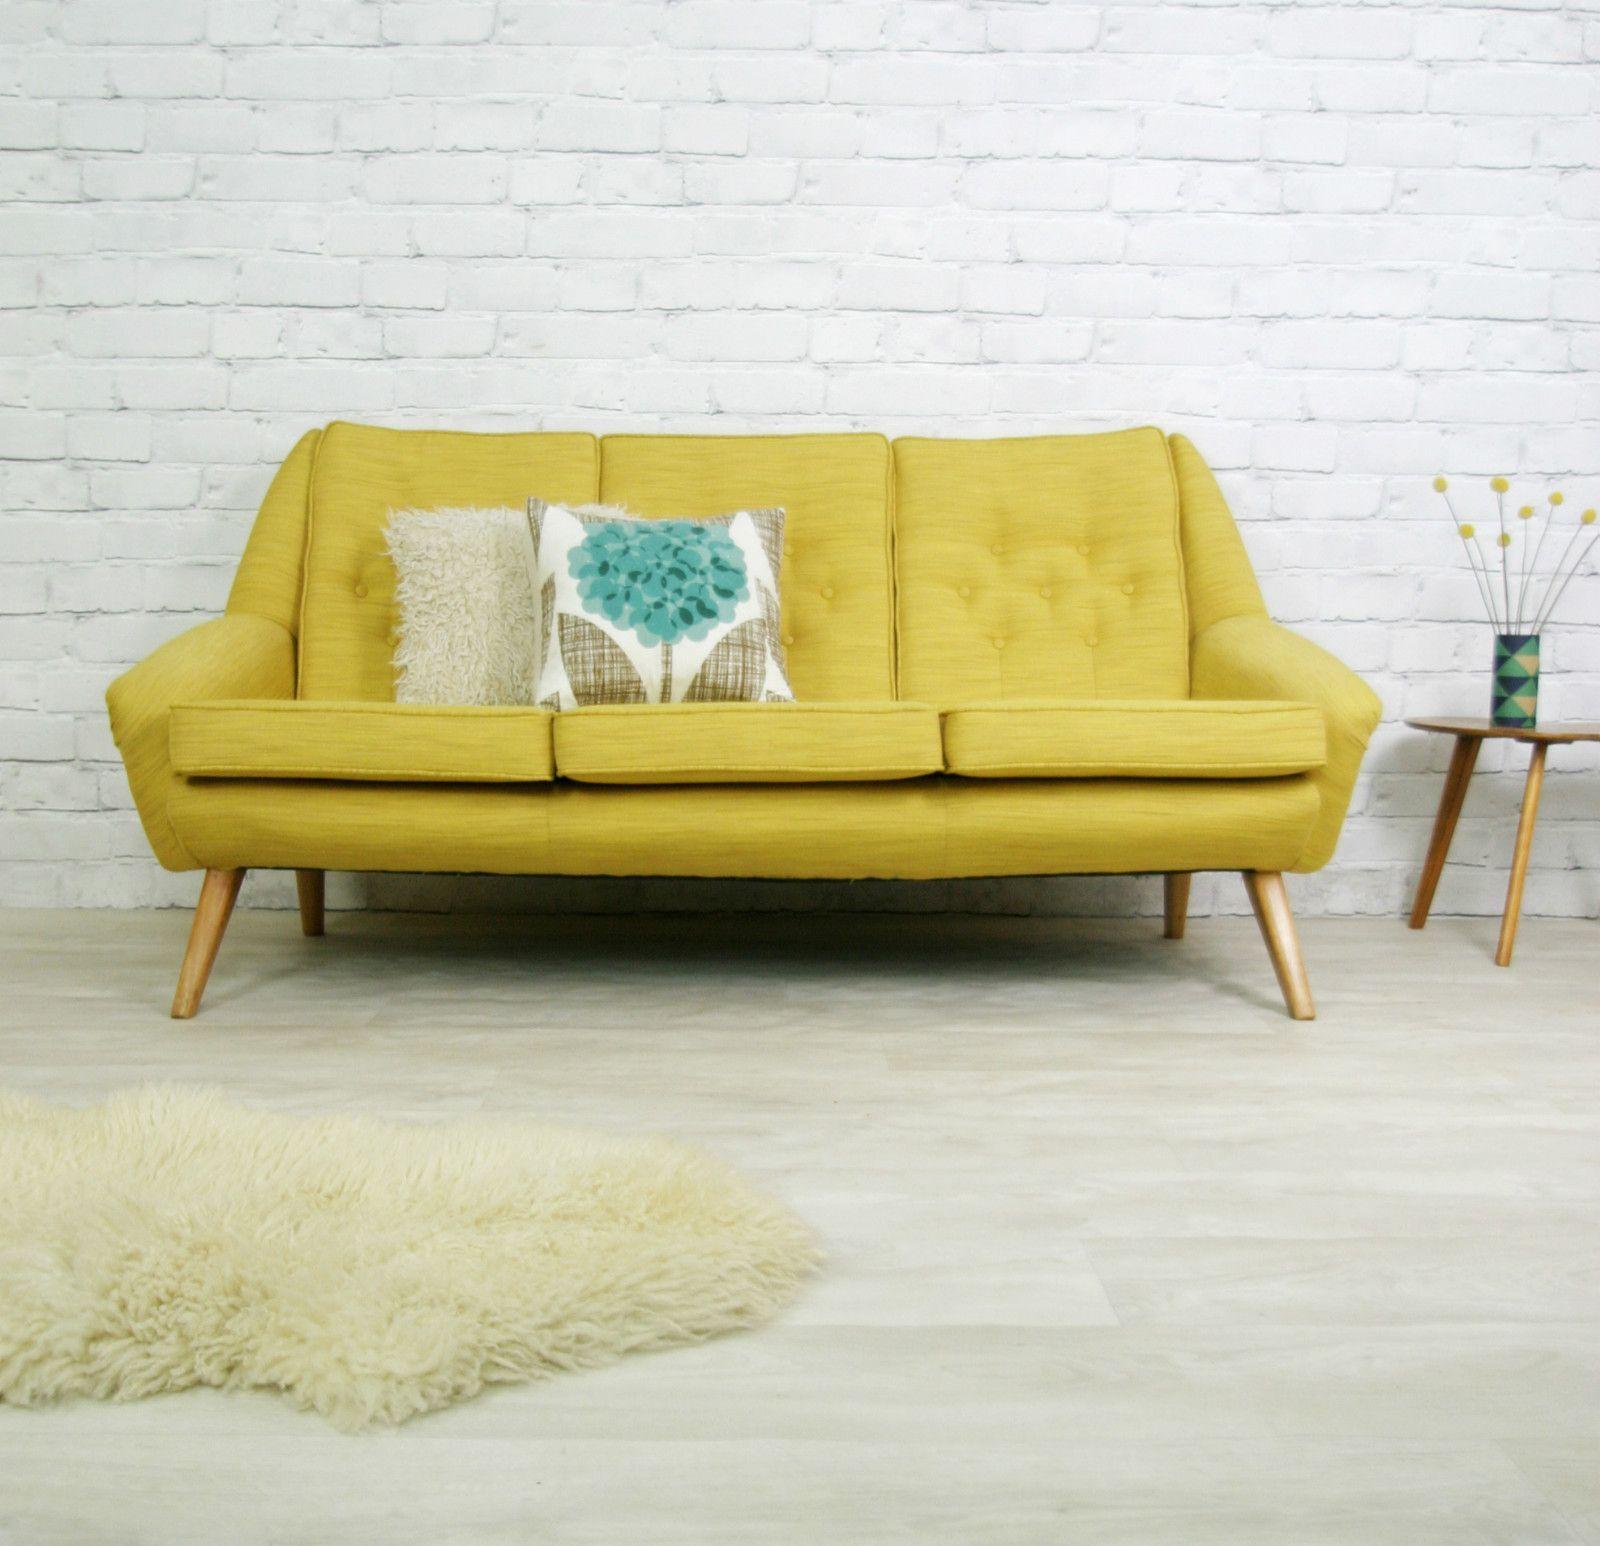 Danish Style Sofa Bed Uk Sofas Madrid Carretera Toledo Vintage Looking Retro Mid Century Mustard